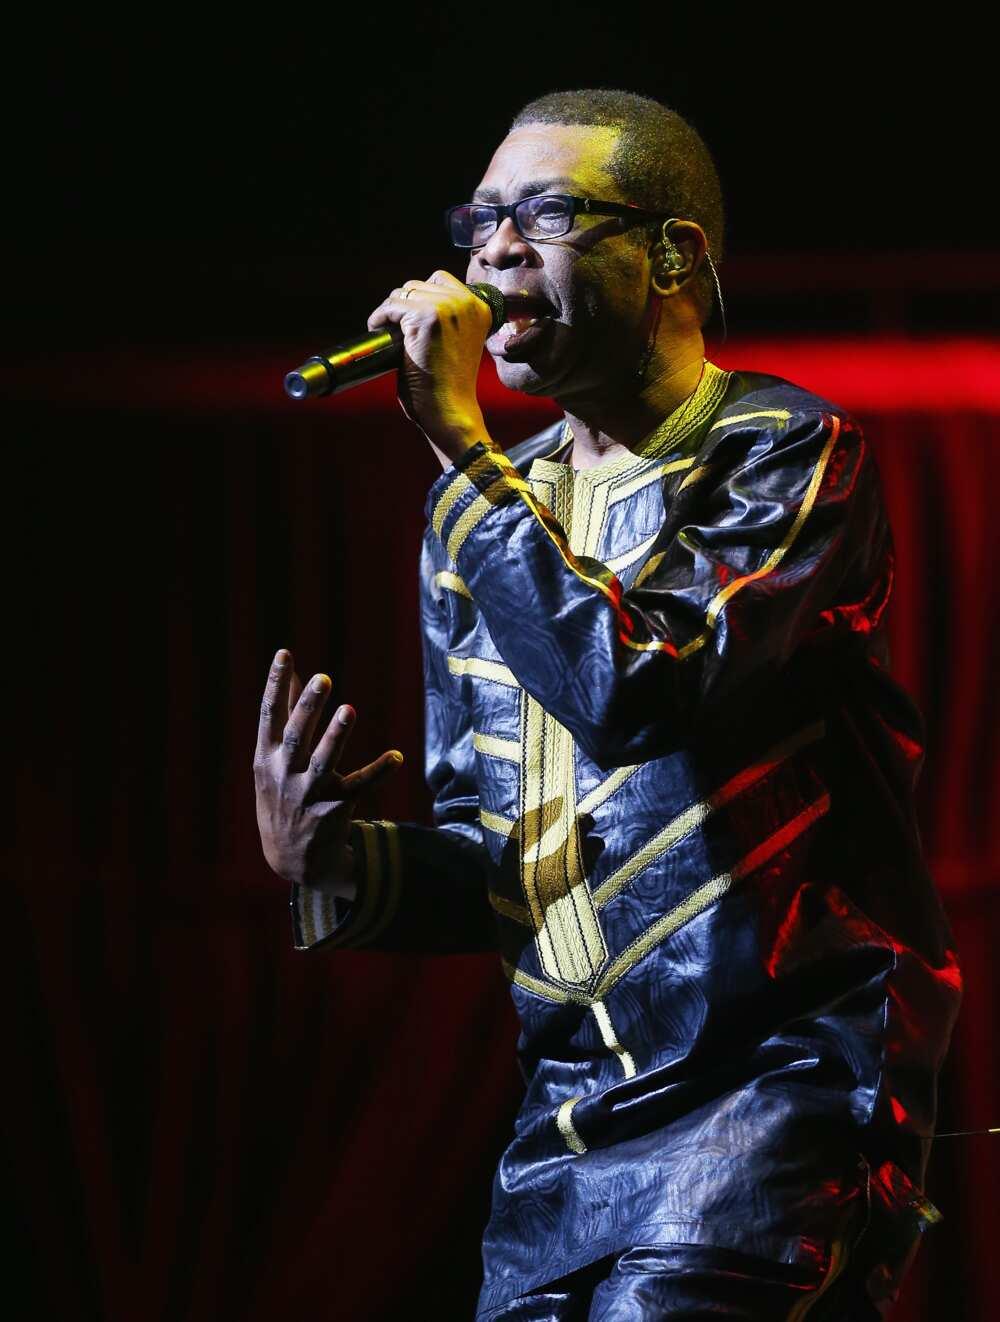 Top 10 richest musician in Africa